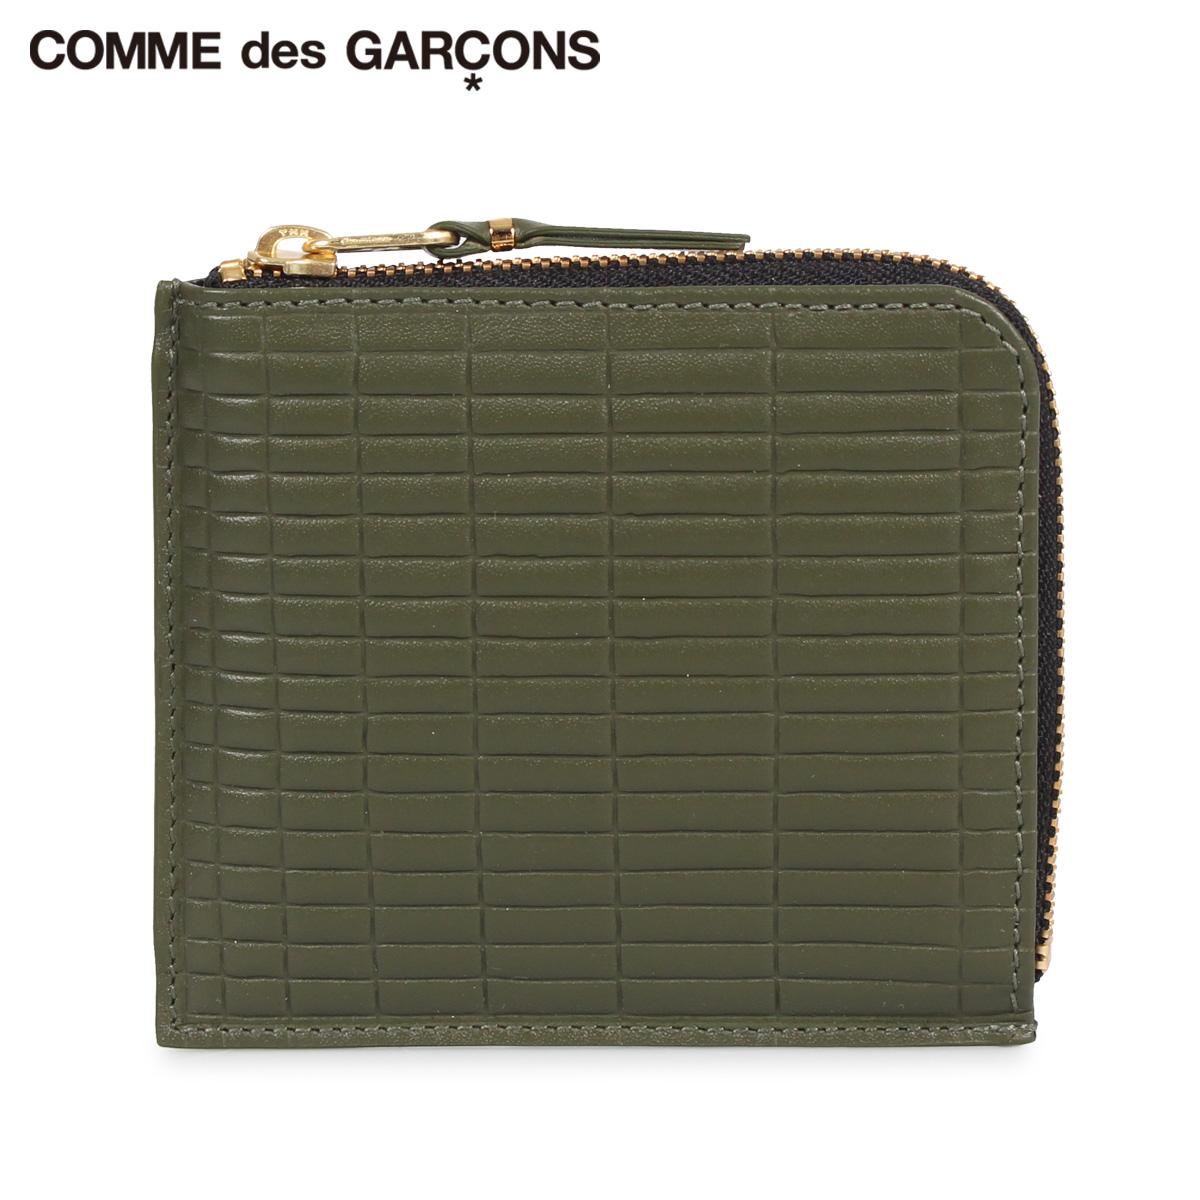 COMME des GARCONS コムデギャルソン 財布 ミニ財布 メンズ レディース BRICK WALLET カーキ SA3100BK